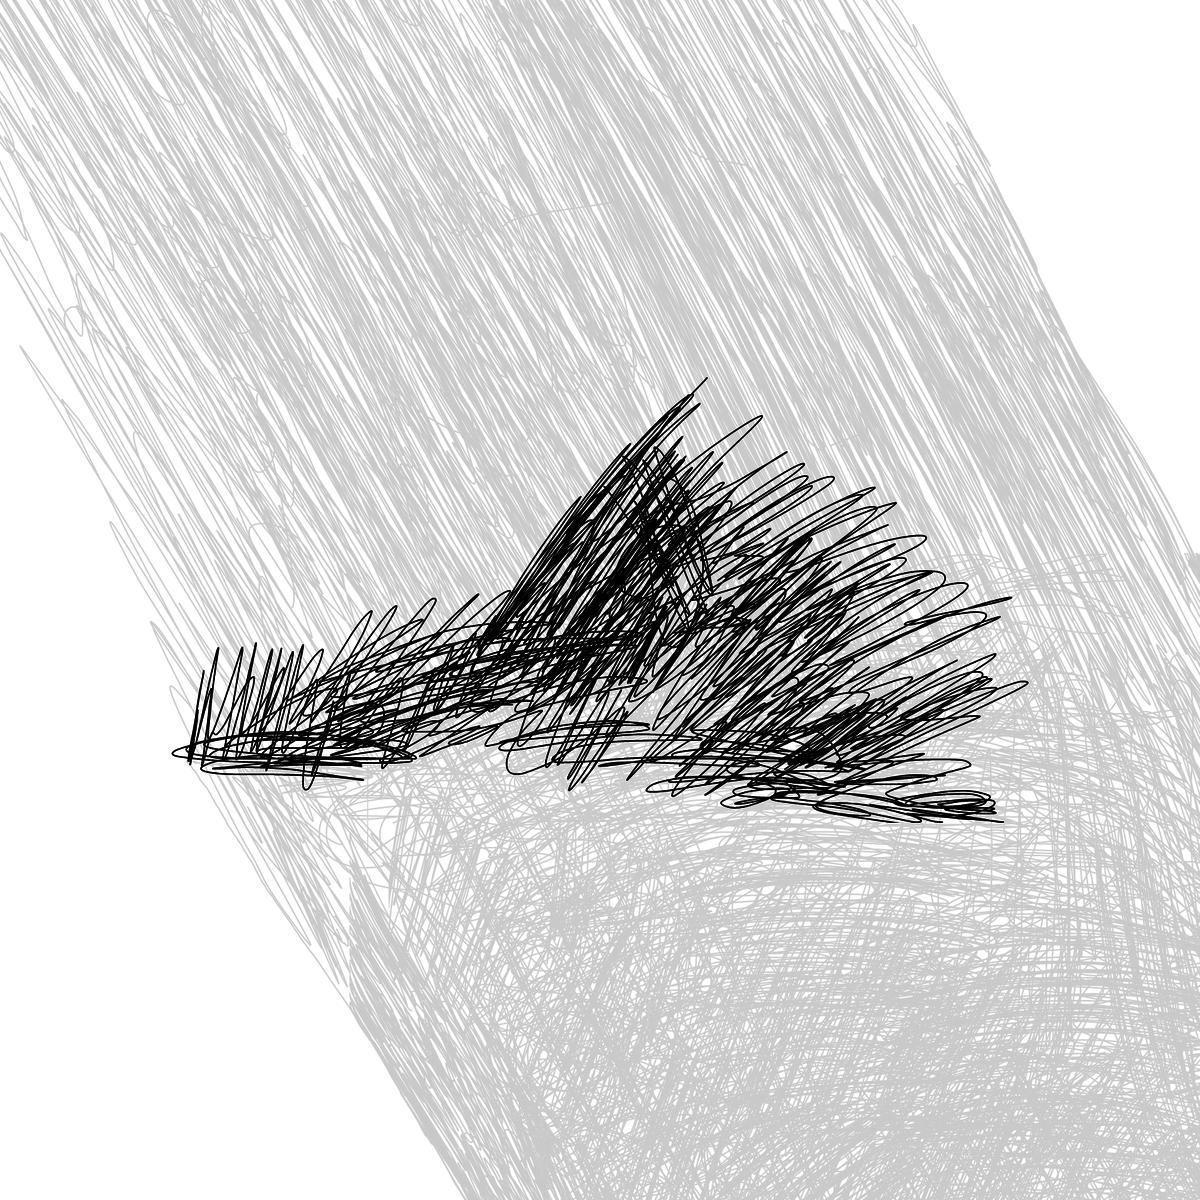 BAAAM drawing#6195 lat:52.4879837036132800lng: 13.4253244400024410